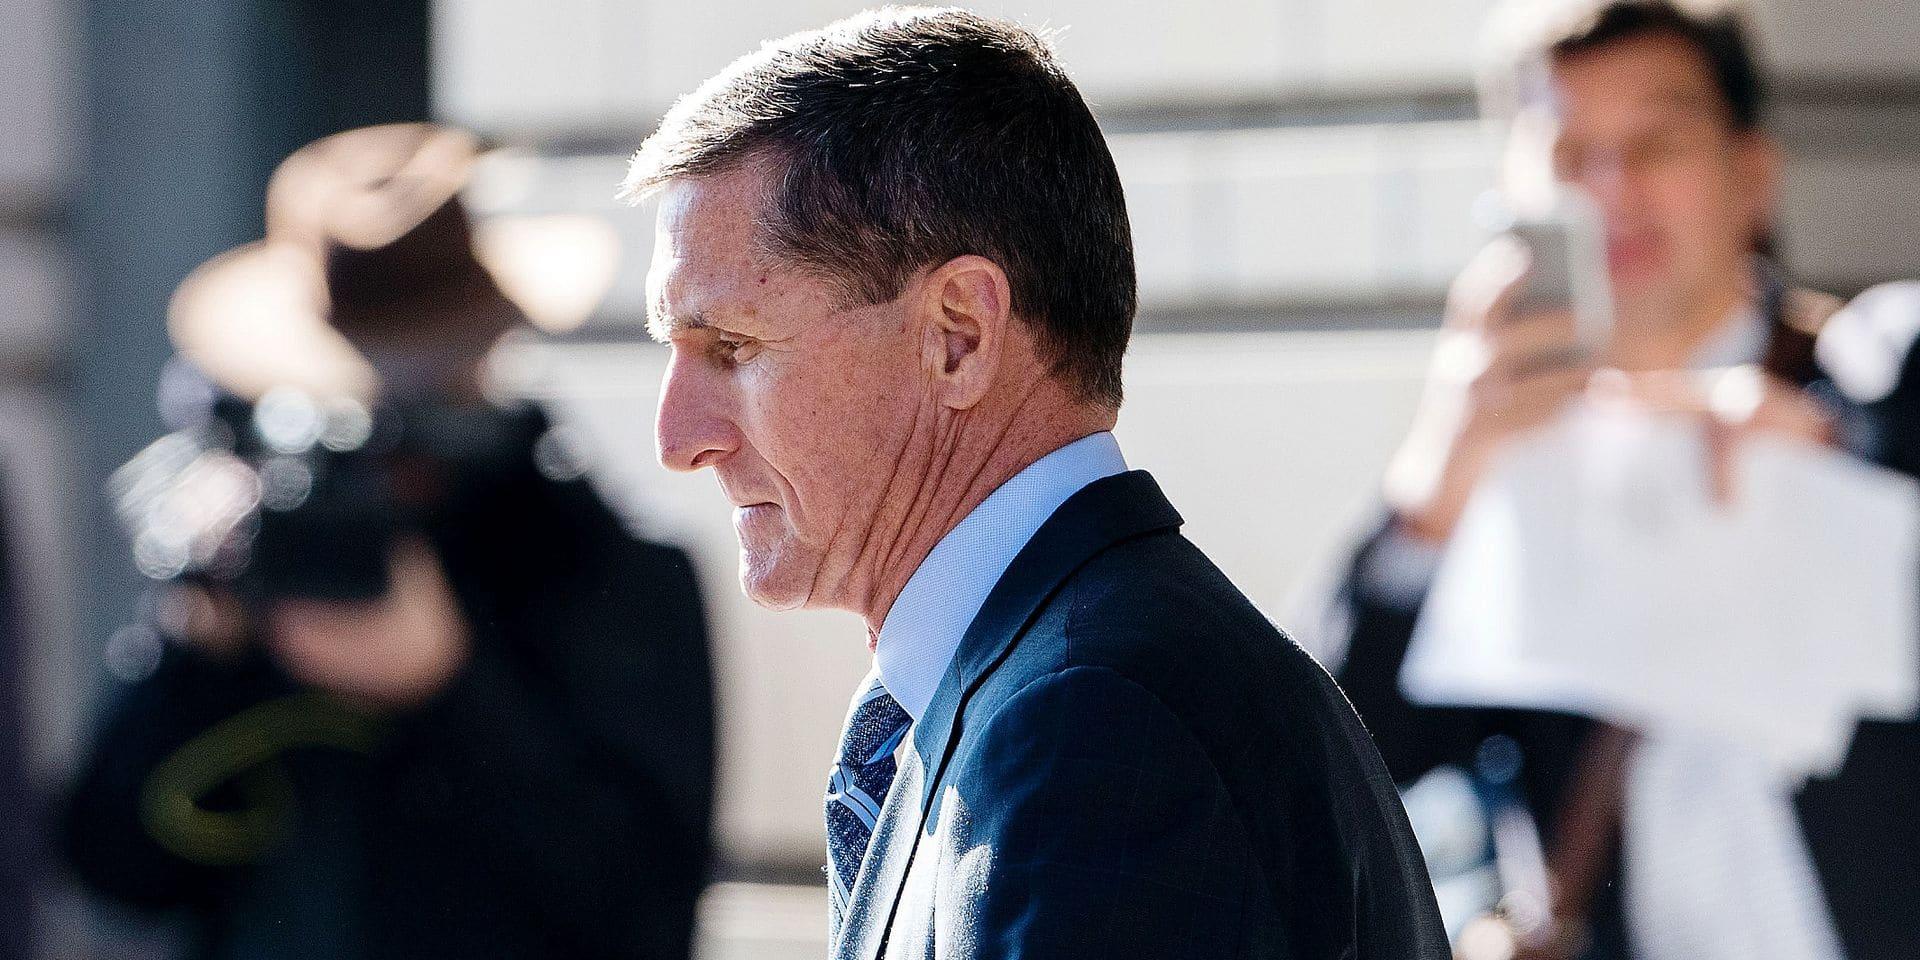 U.S.-WASHINGTON D.C.-FORMER NATIONAL SECURITY ADVISER-FLYNN-FBI-FALSE STATEMENTS